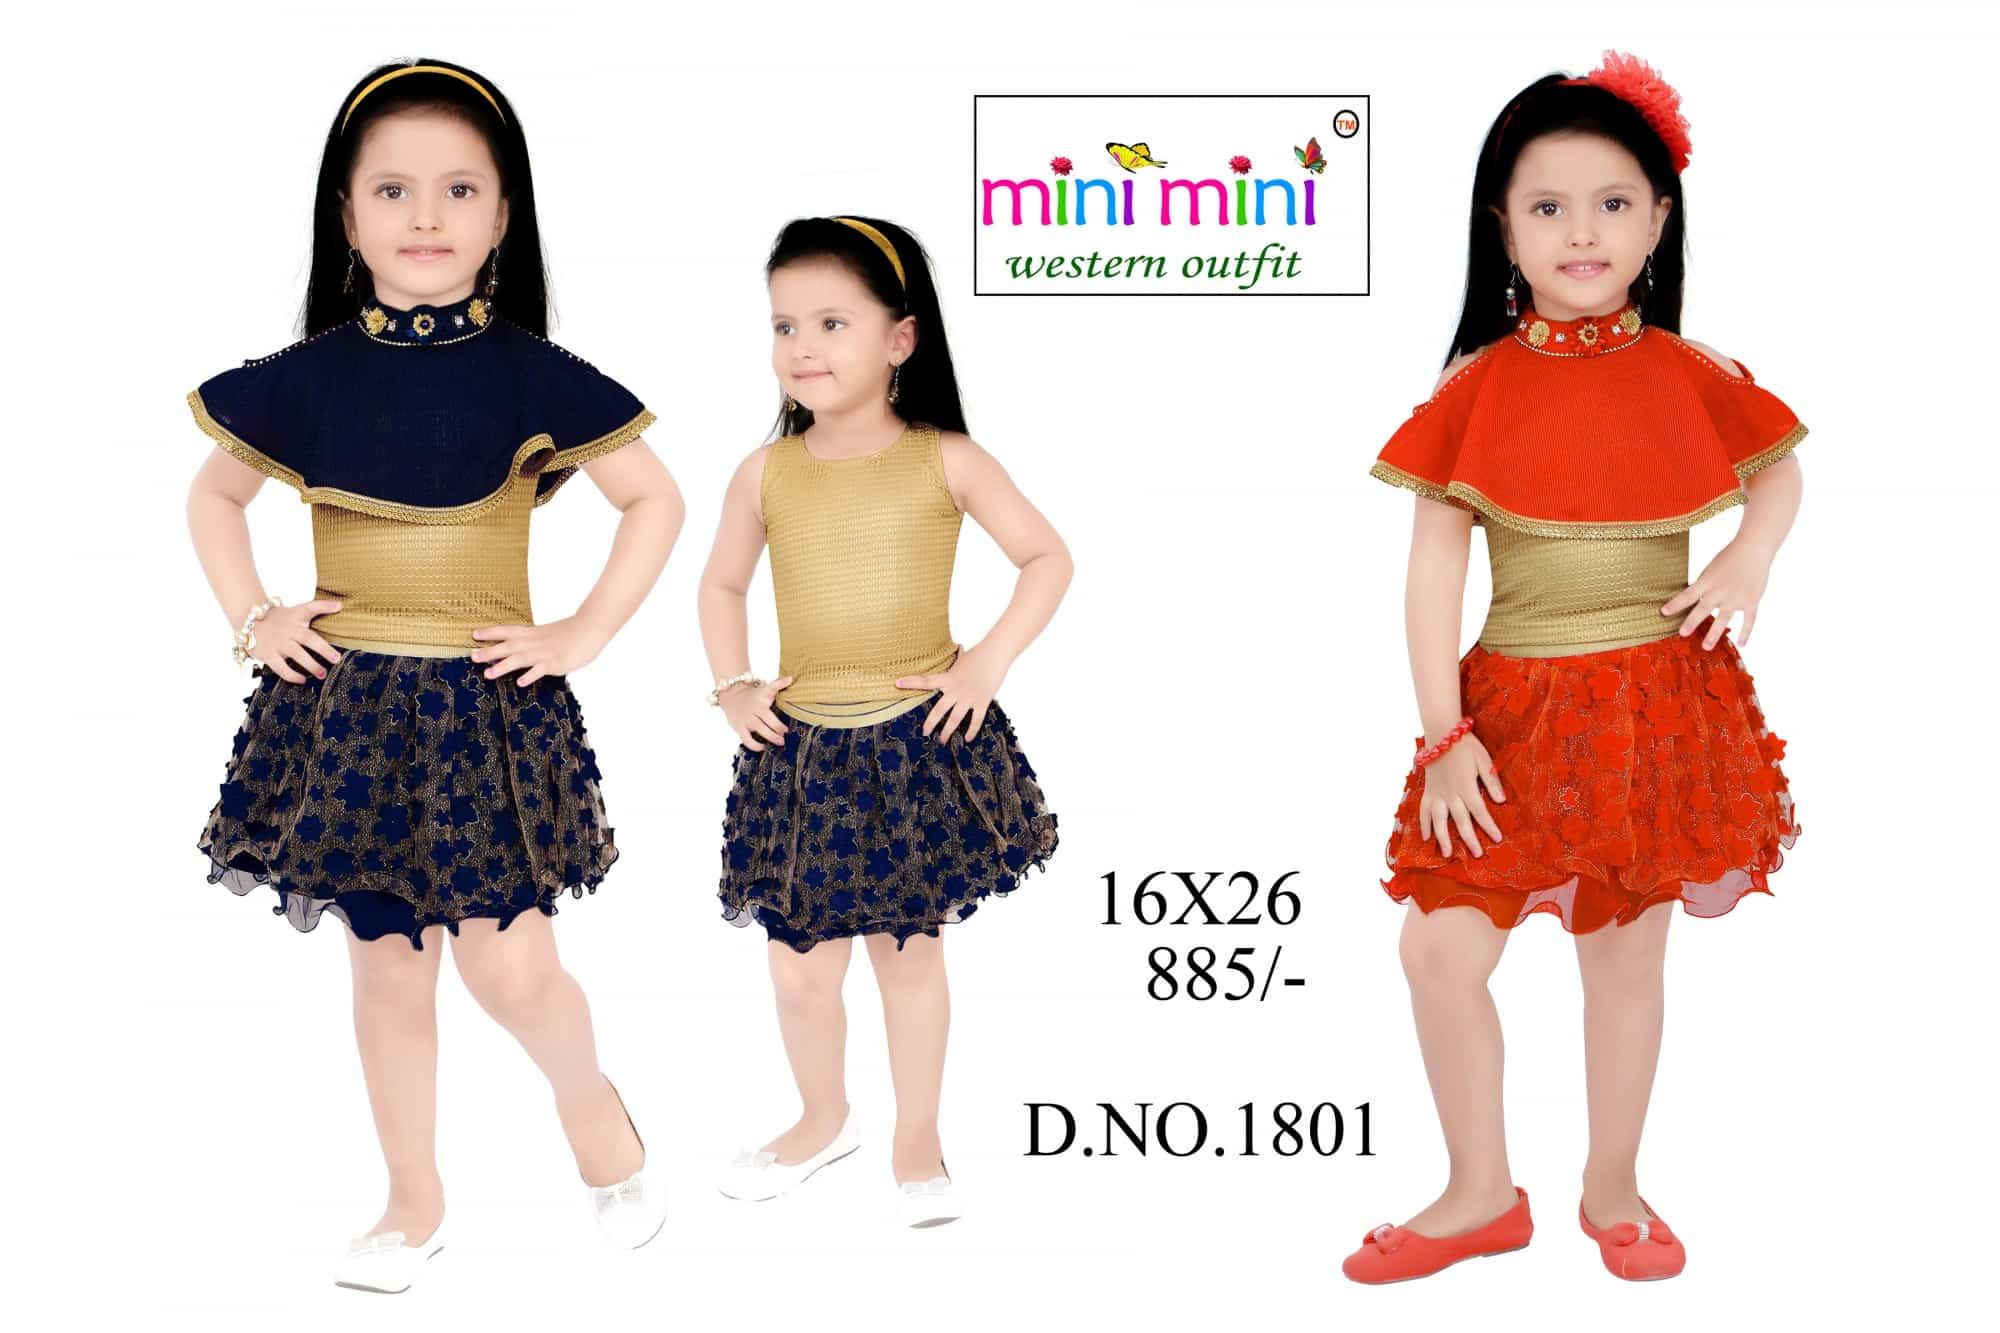 bd9f89bbaf Kidsmini Clothing Co, Dadar West - Children Readymade Garment Manufacturers  in Mumbai - Justdial